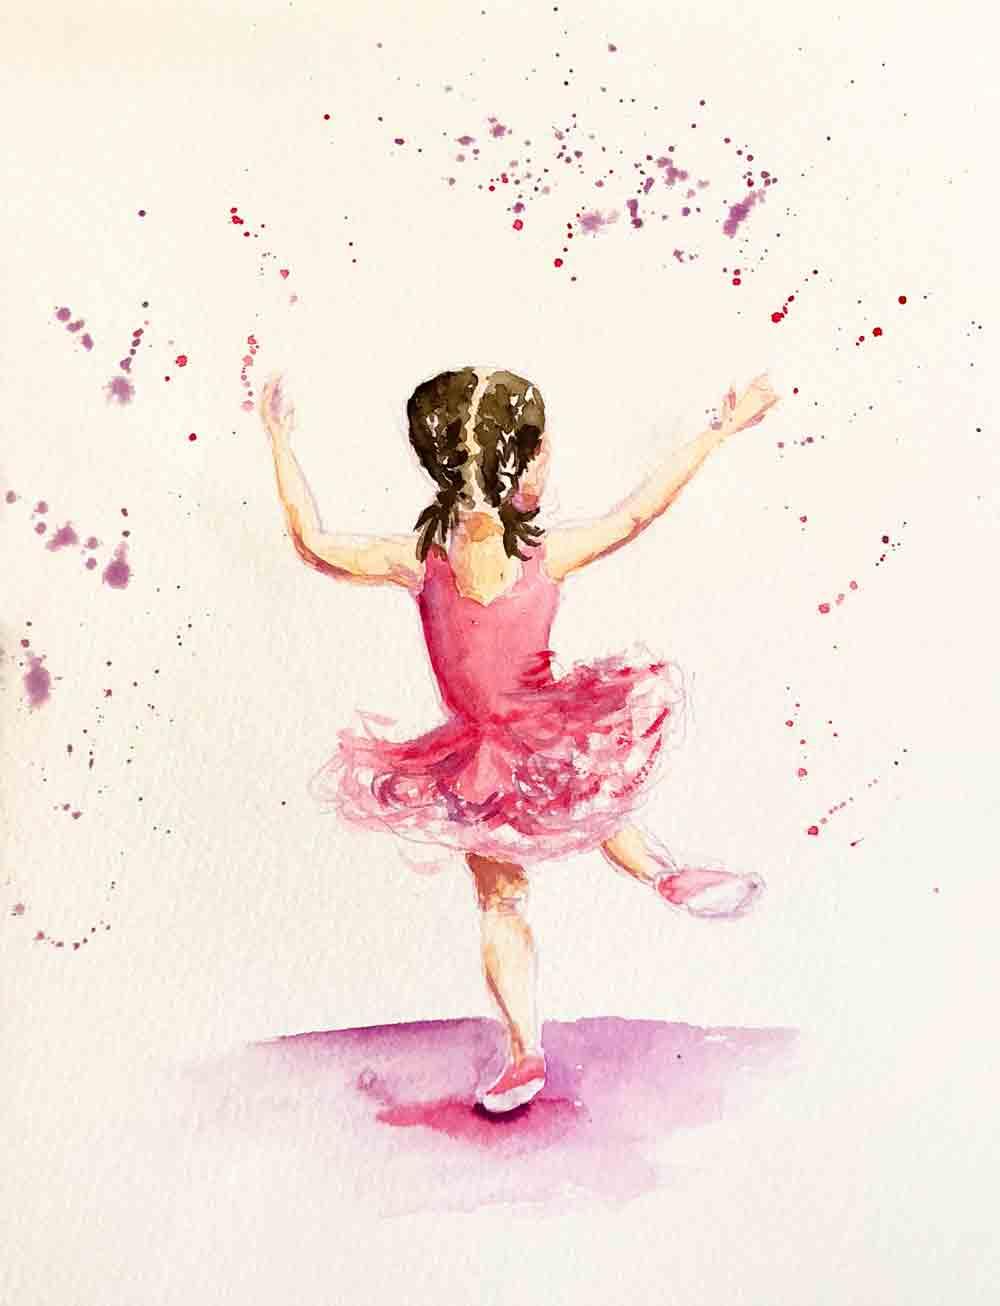 Watercolour-Kids-5-Dance-like-no-one-is-watching-photo-kw.jpg